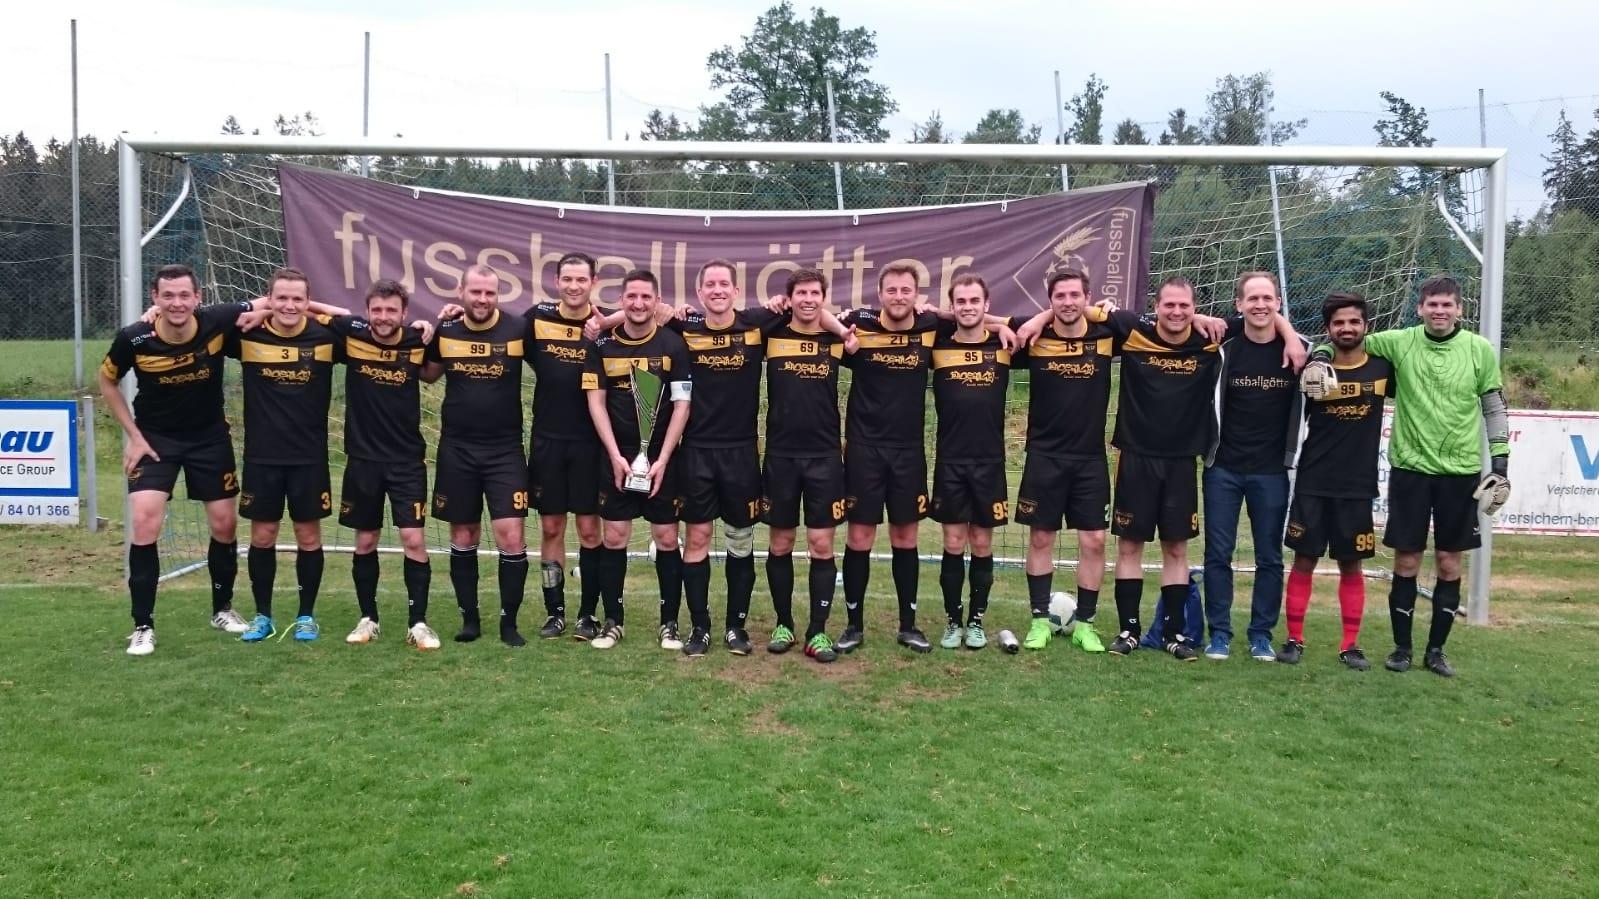 Supercup Champion 2018 - Fussballgötter Bach